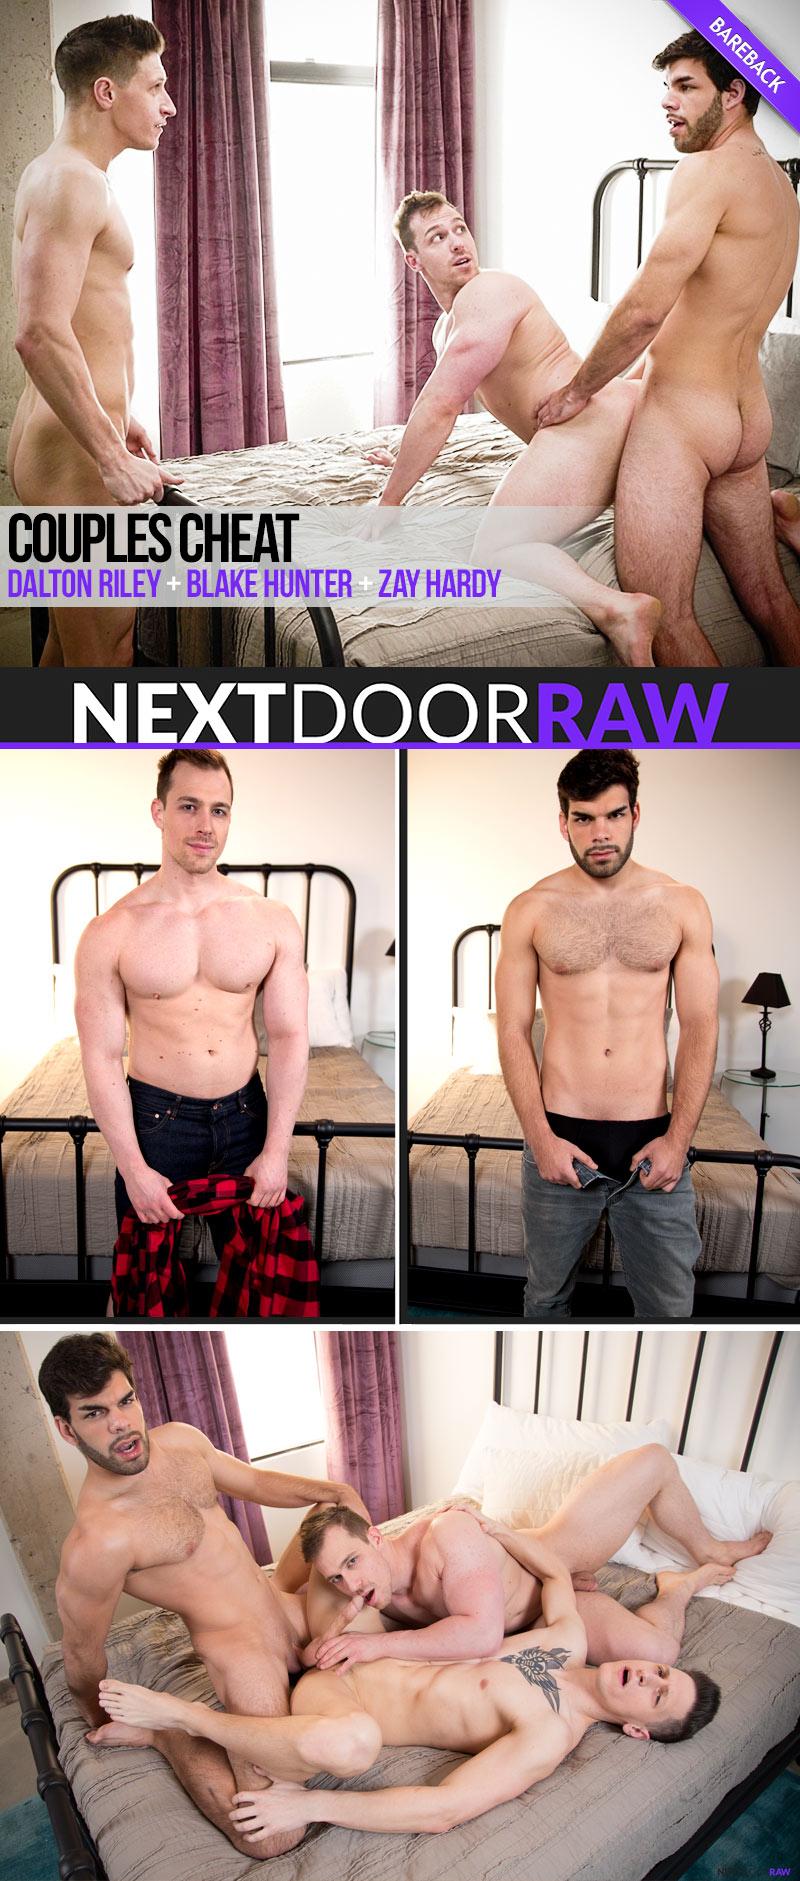 Couples Cheat (Dalton Riley, Blake Hunter and Zay Hardy) (Bareback) at NextDoorRAW!